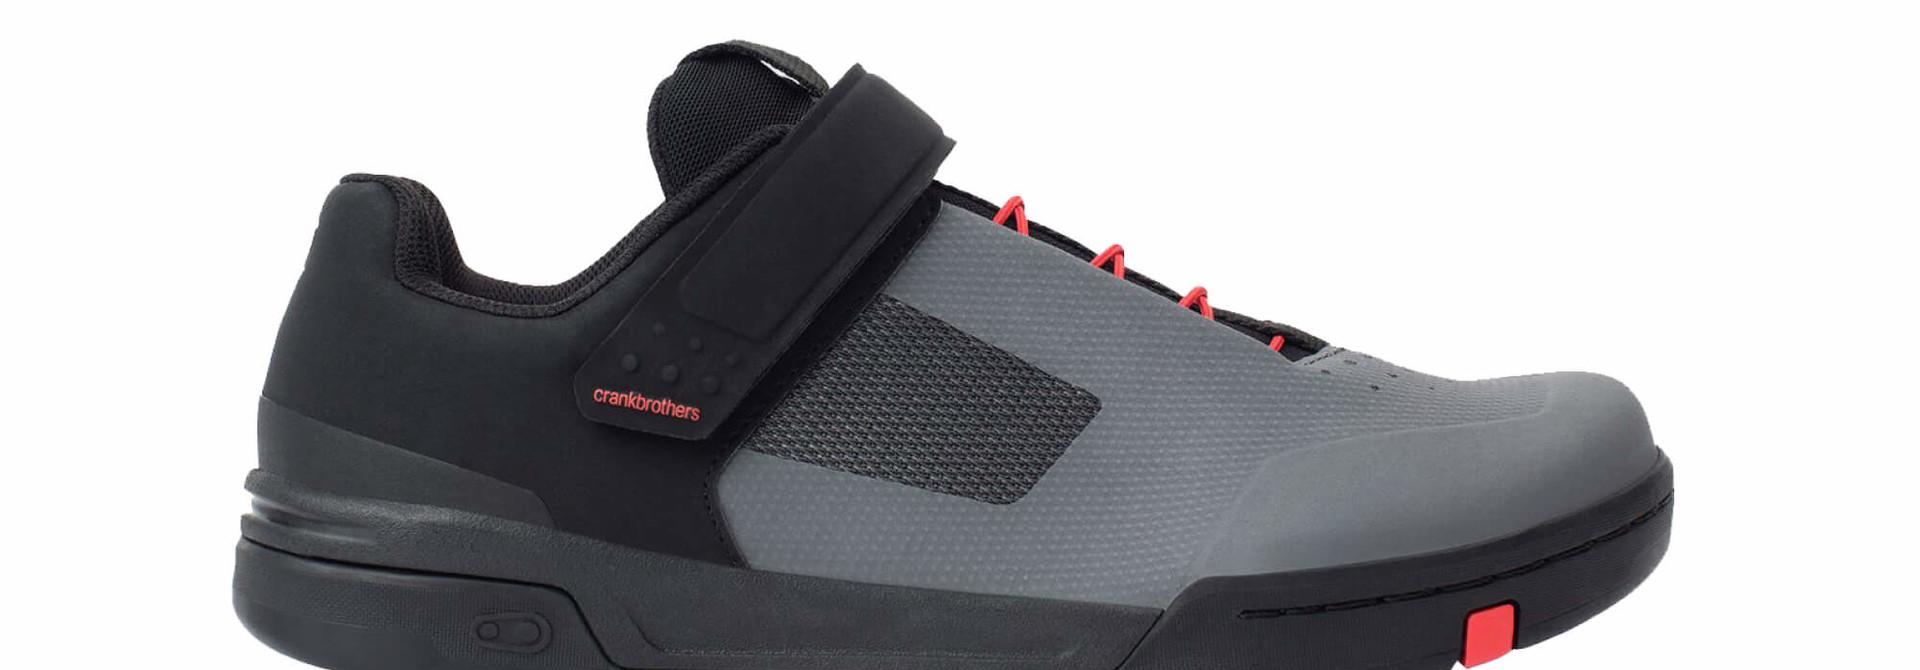 Shoes Stamp Speedlace Flat